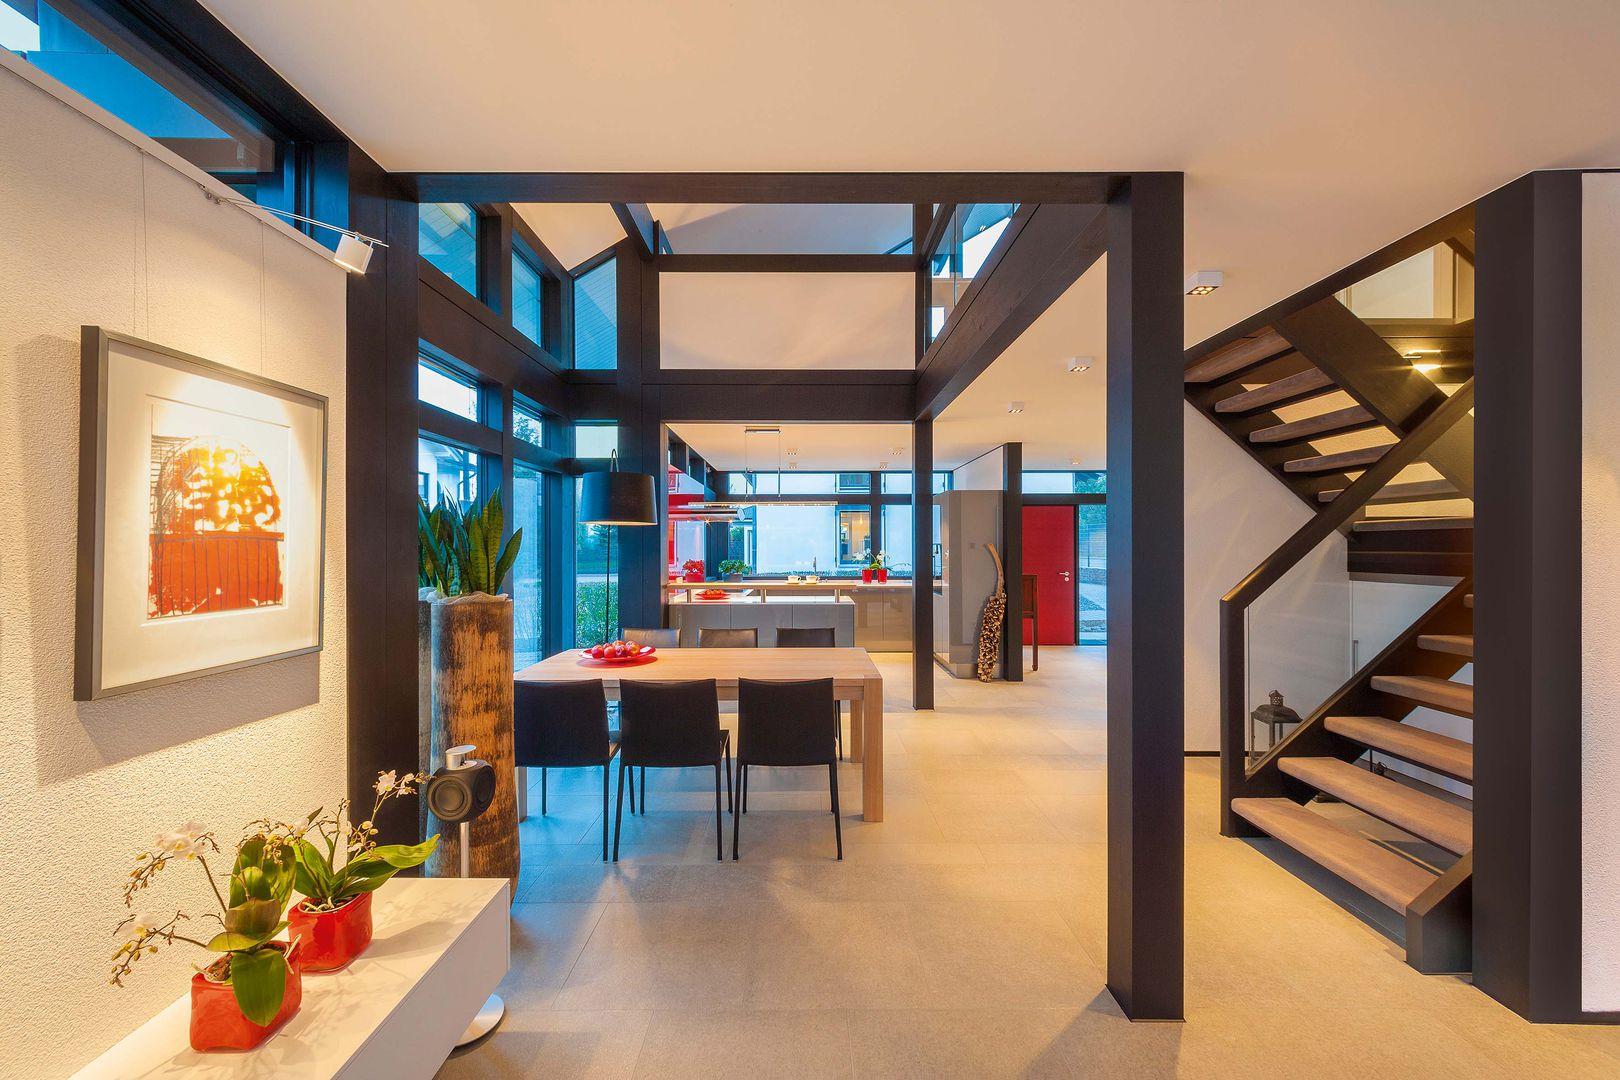 huf haus musterhaus modum 8 10 wuppertal. Black Bedroom Furniture Sets. Home Design Ideas